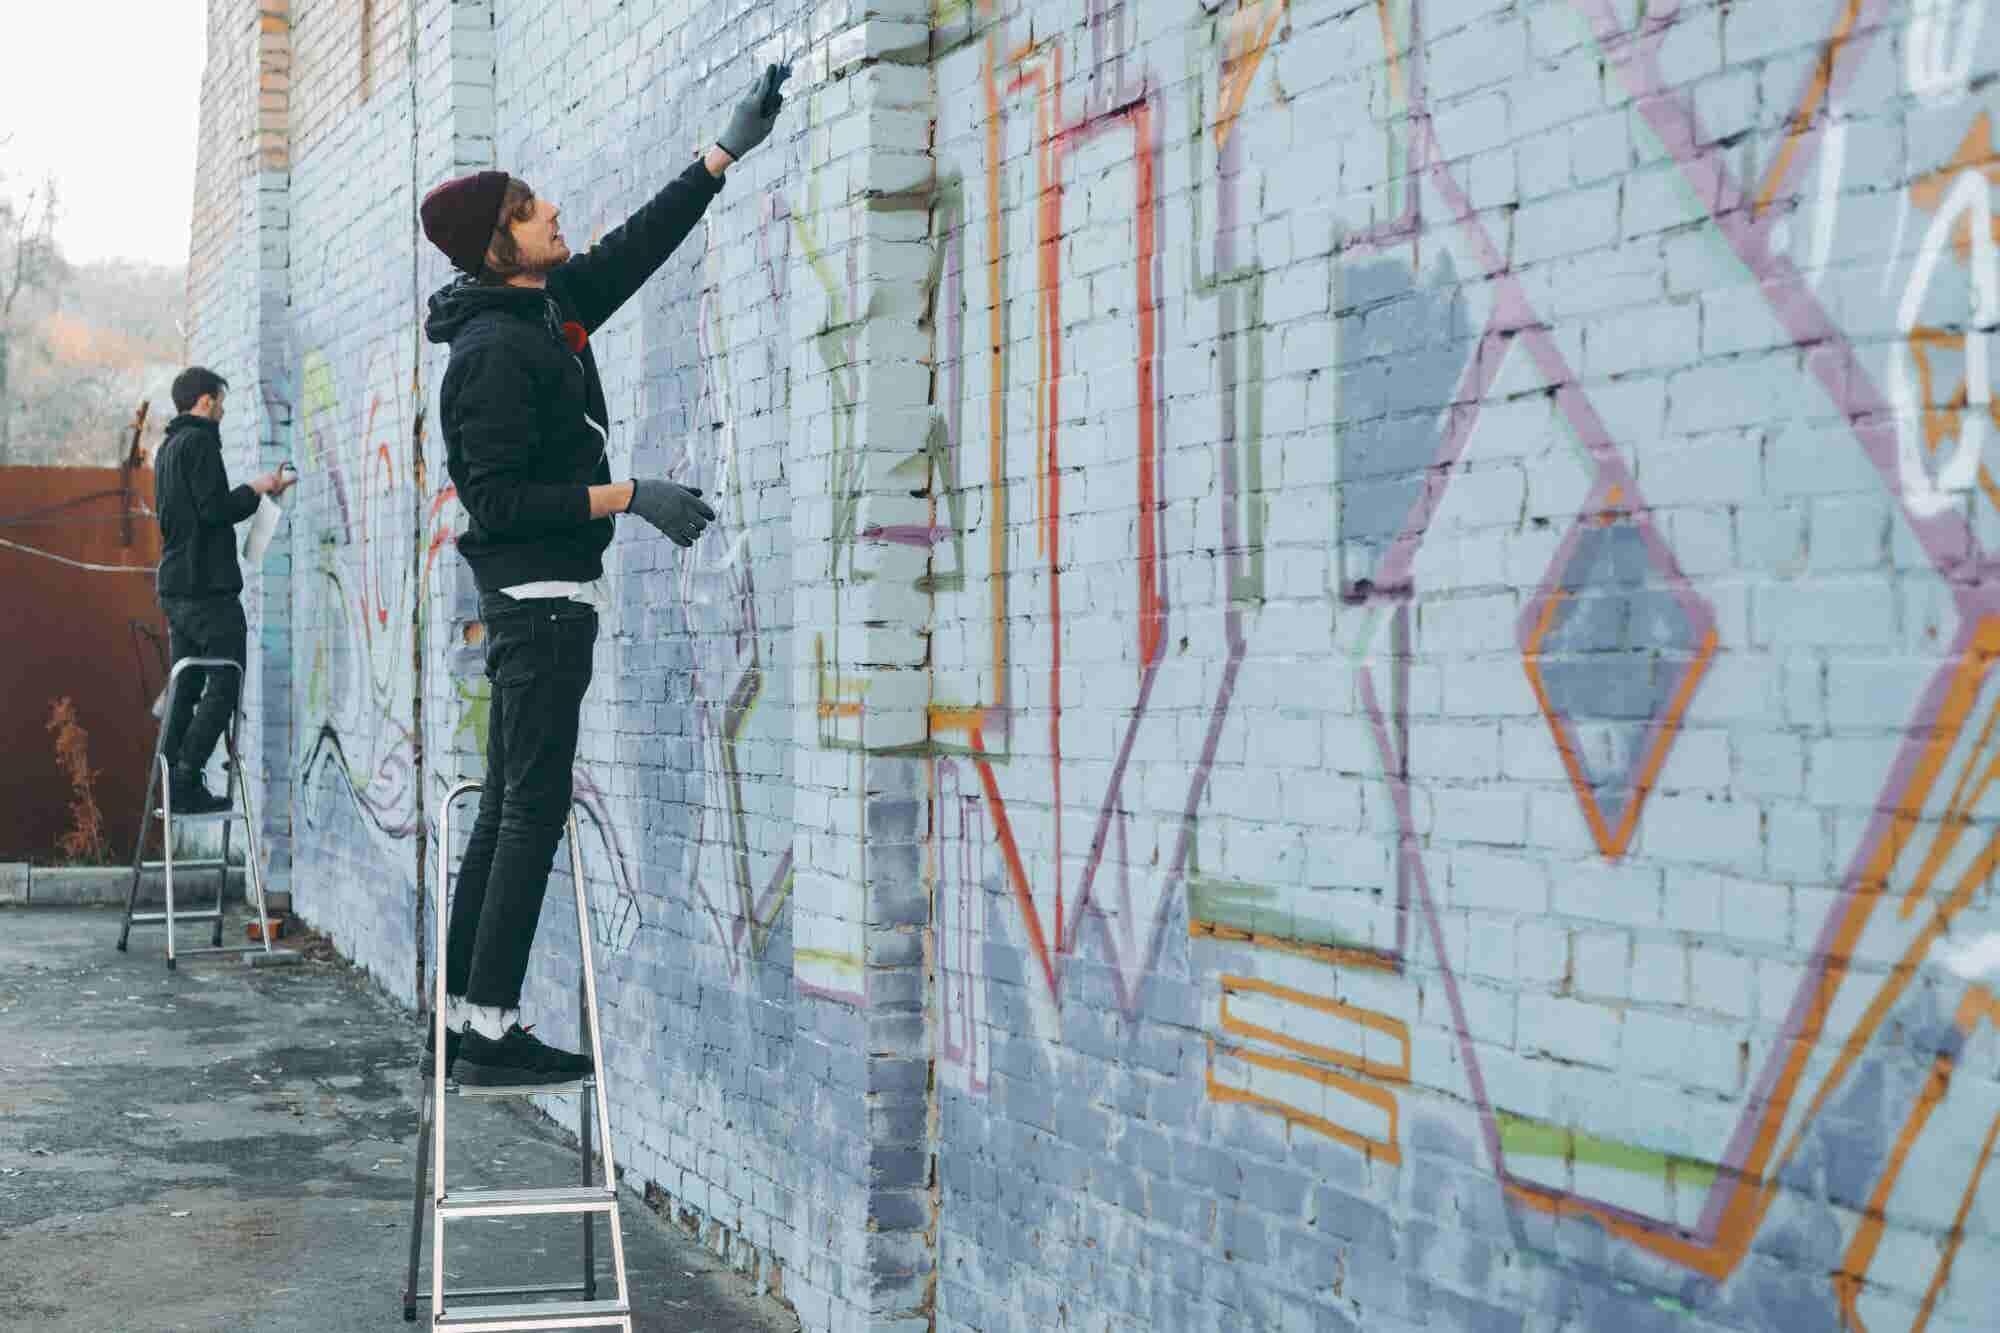 ?Pintar grafiti como negocio? 5 ideas de emprendimientos urbanos